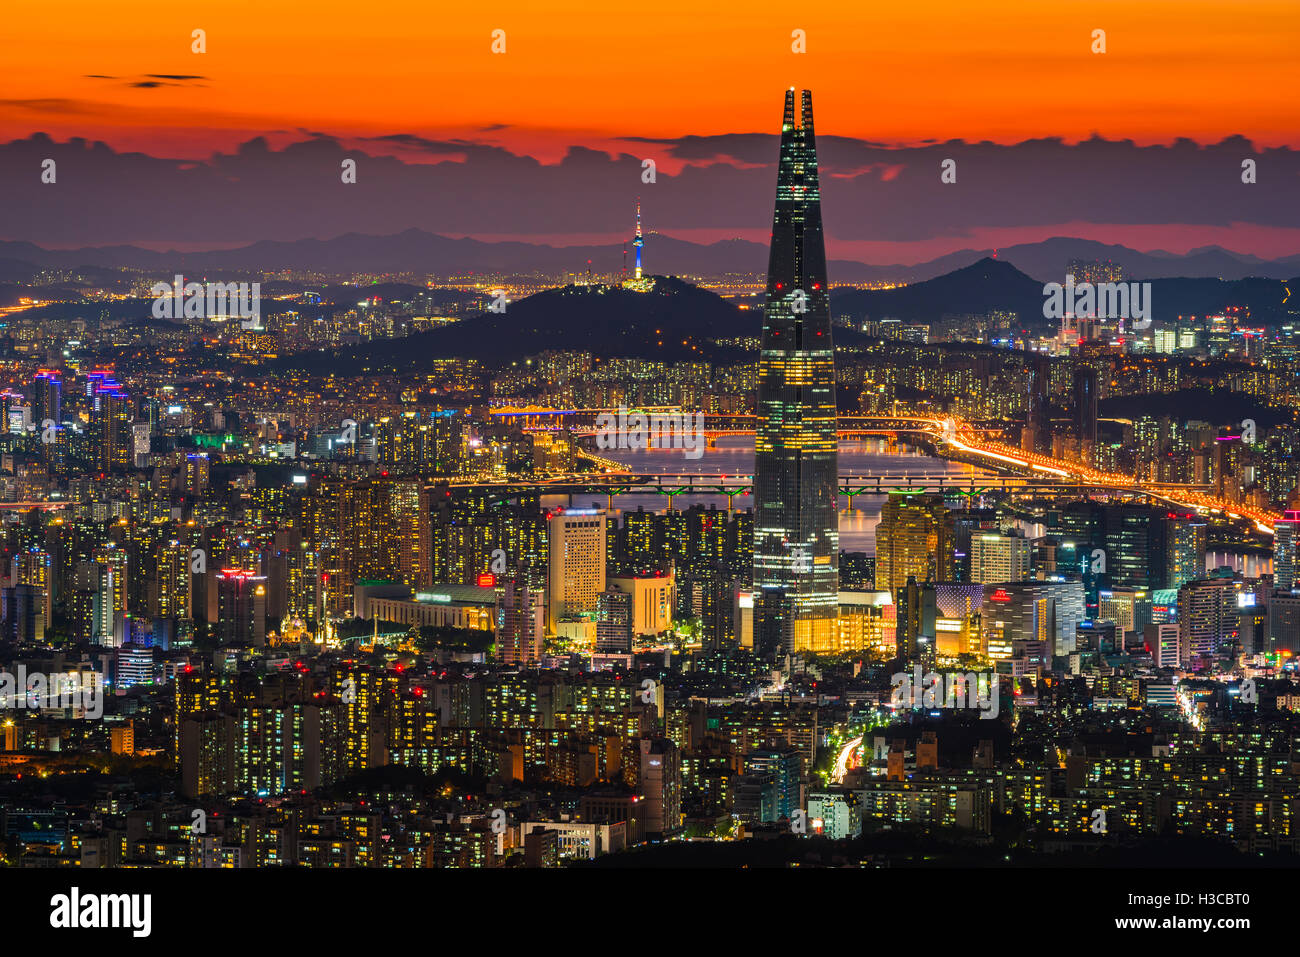 Seoul City Skyline, downtown view of South Korea. - Stock Image